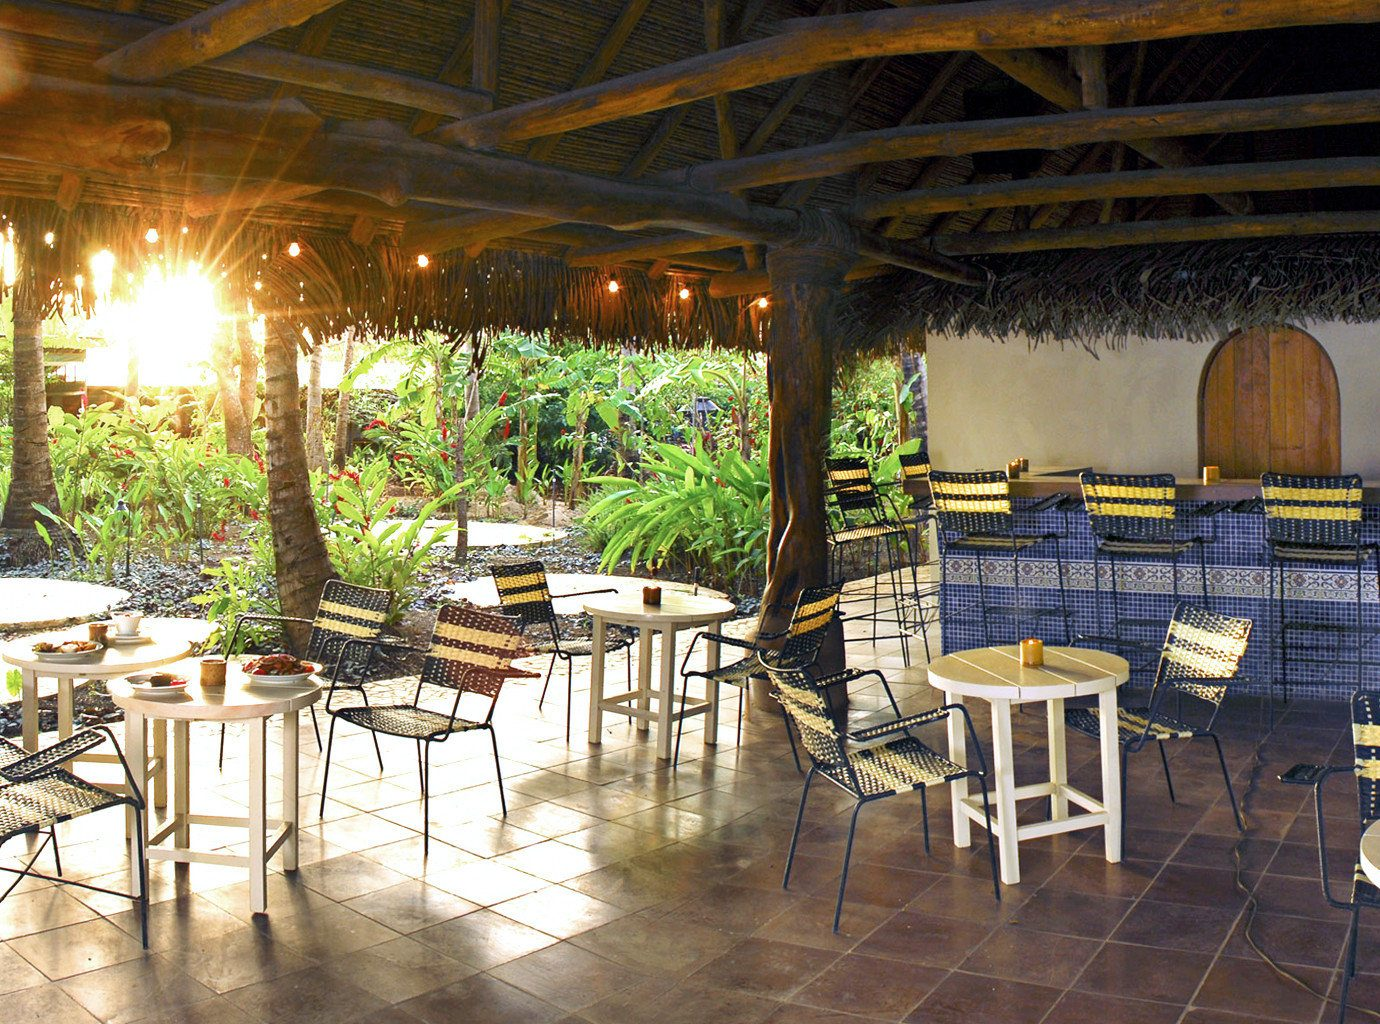 Restaurant at Harmony Hotel in Costa RIca